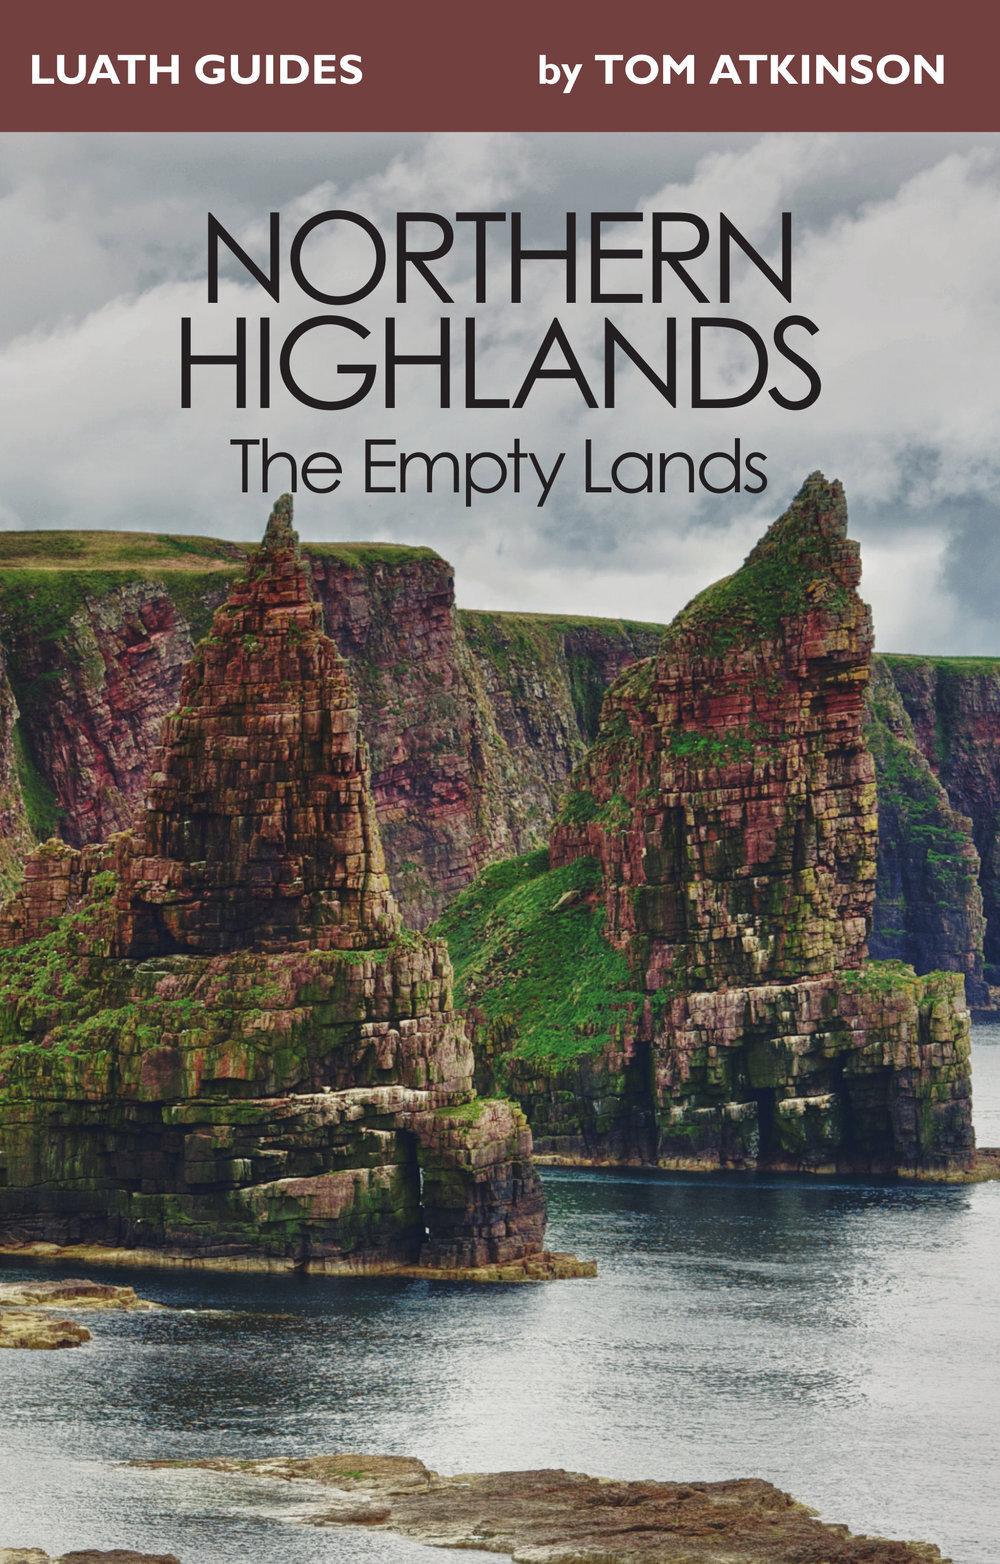 Northern+Highlands+Tom+Atkinson+9781913025199+Luath+Press.jpg